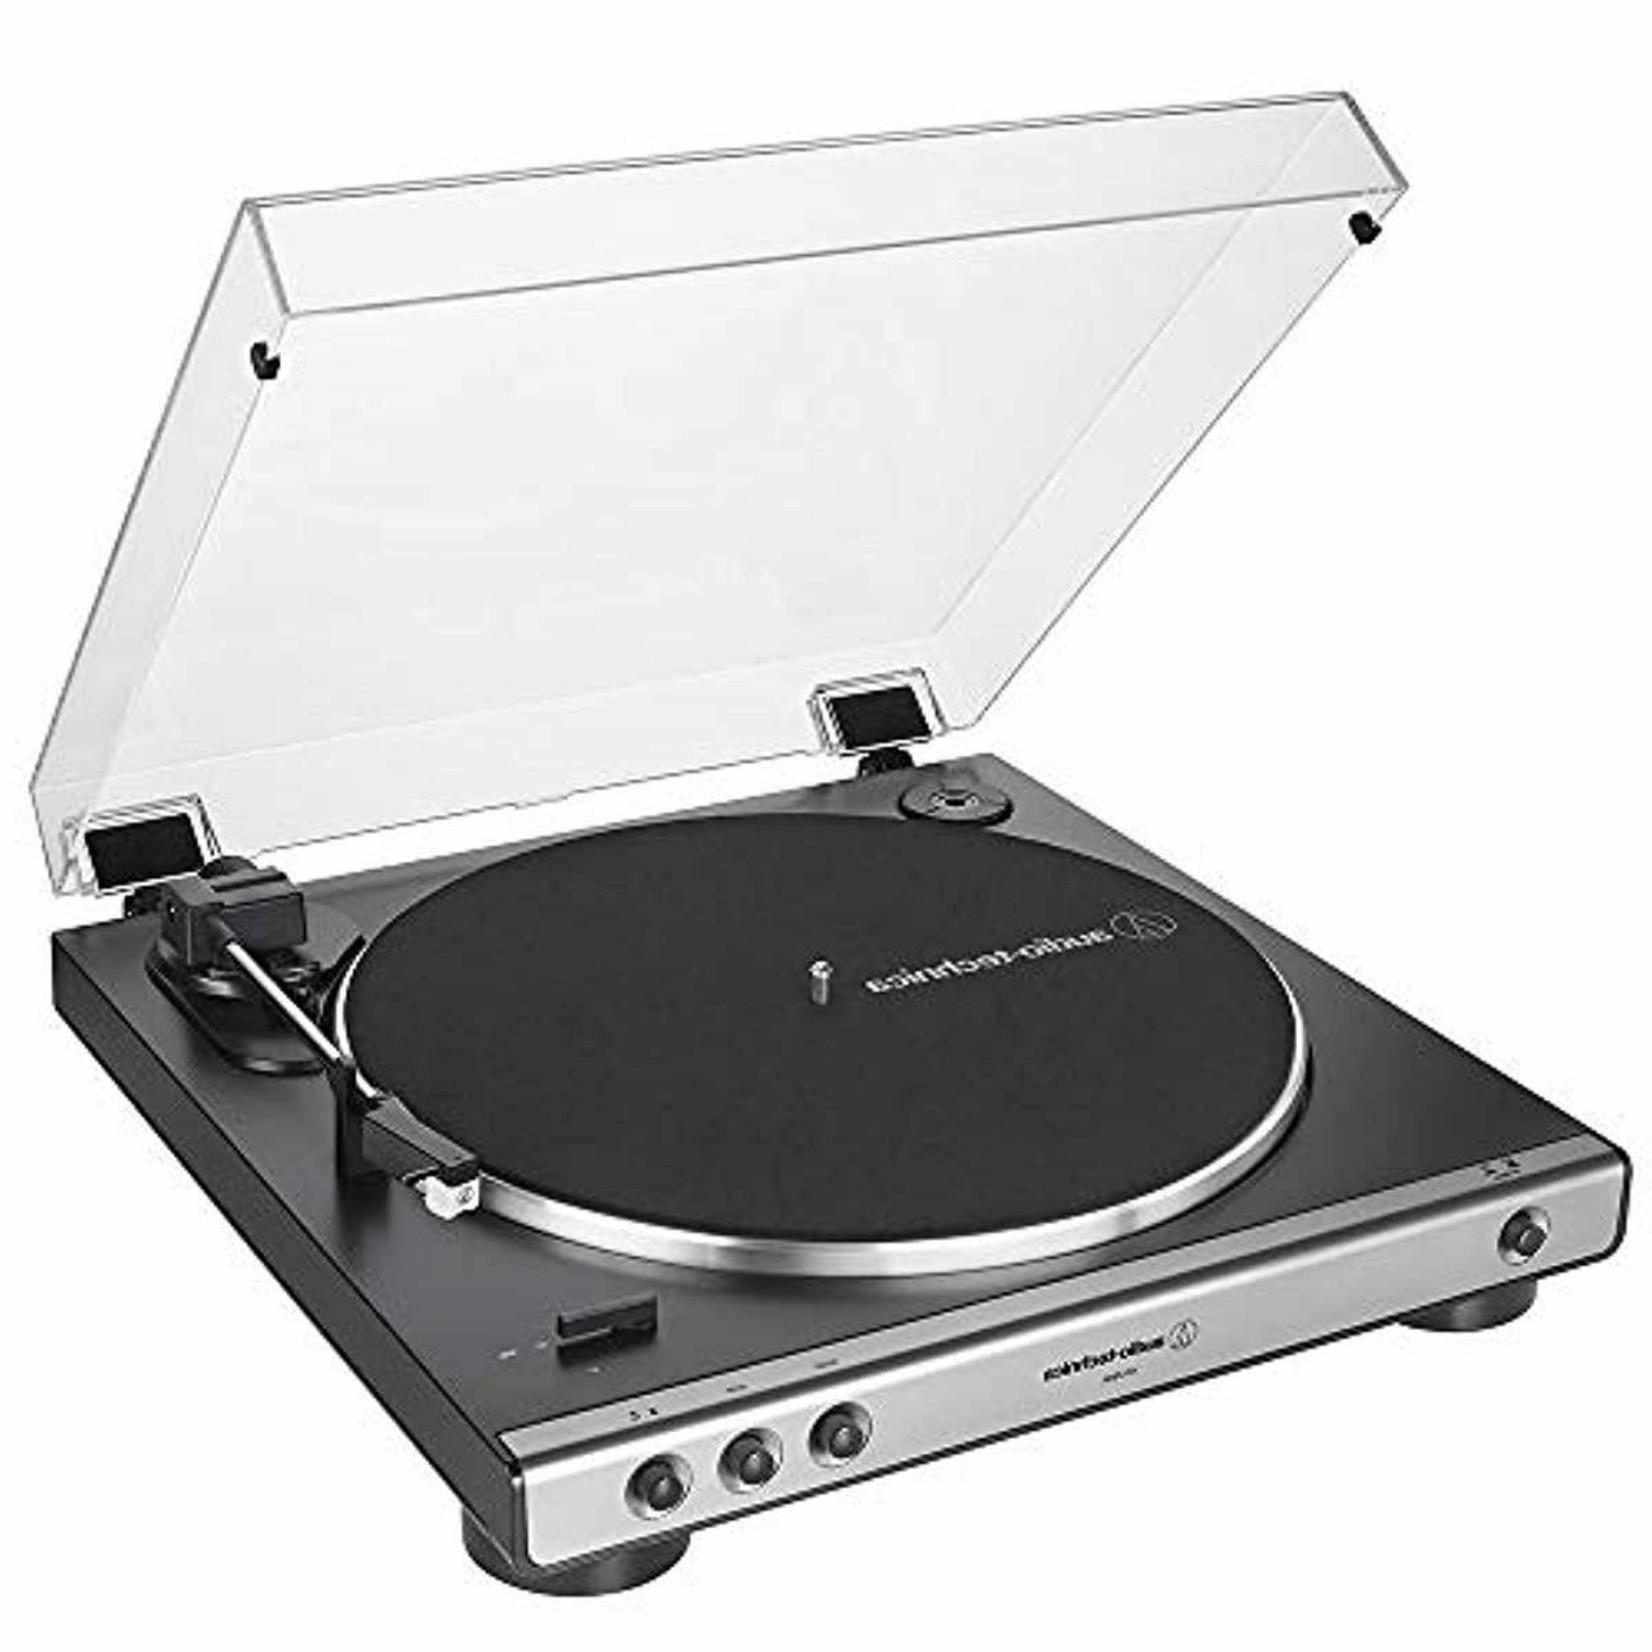 AUDIO-TECHNICA AT-LP60X TURNTABLE